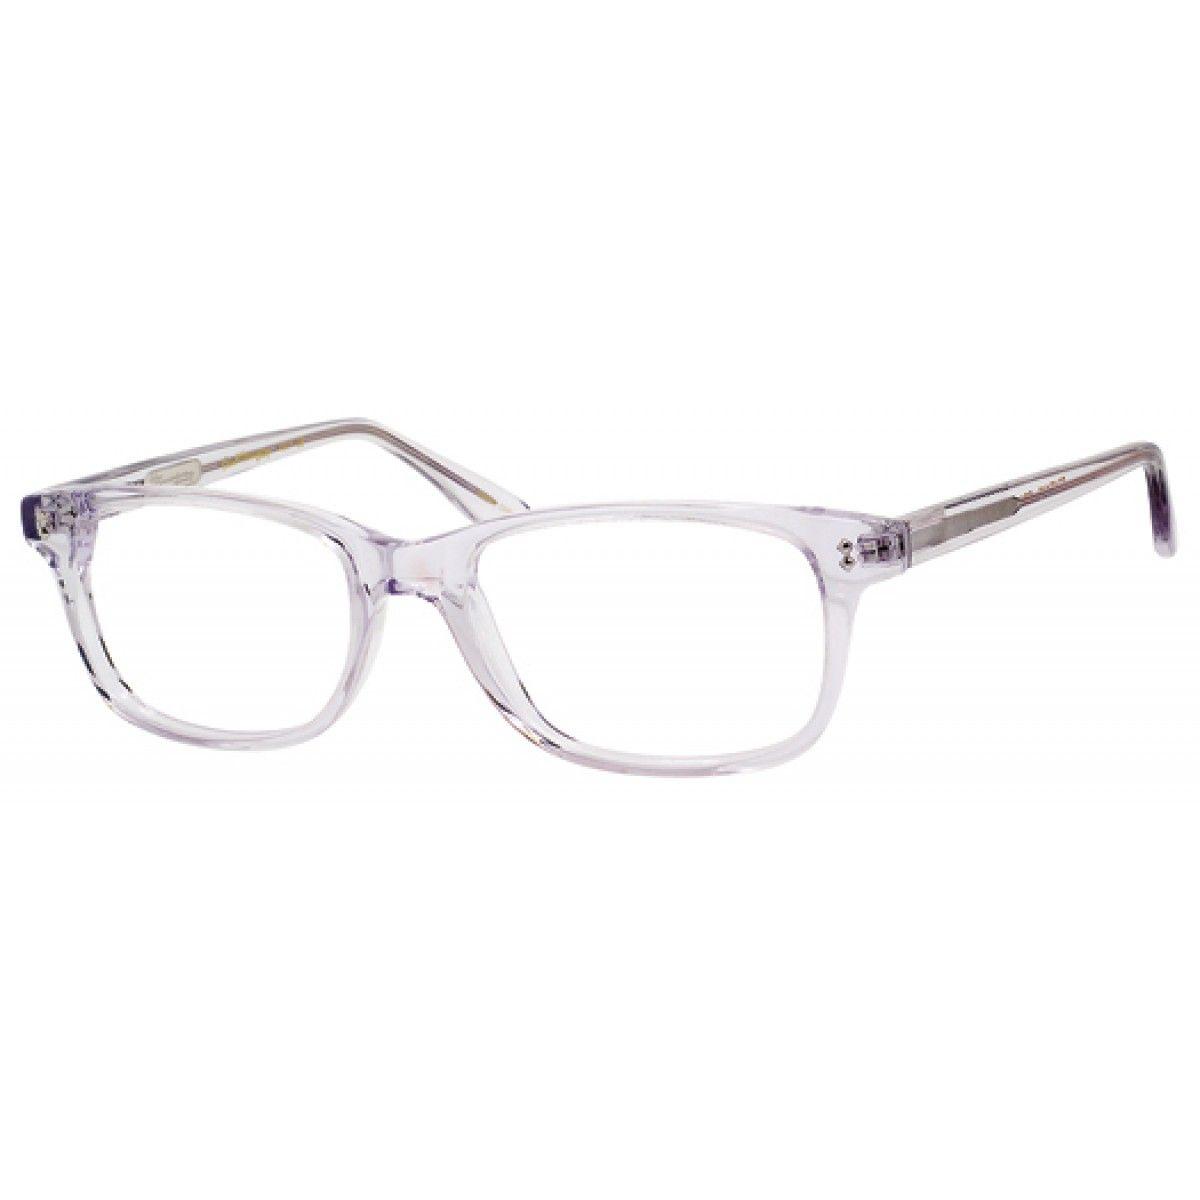 Shiny Tortoise Glasses Eyeglass Com Womens Eyeglasses